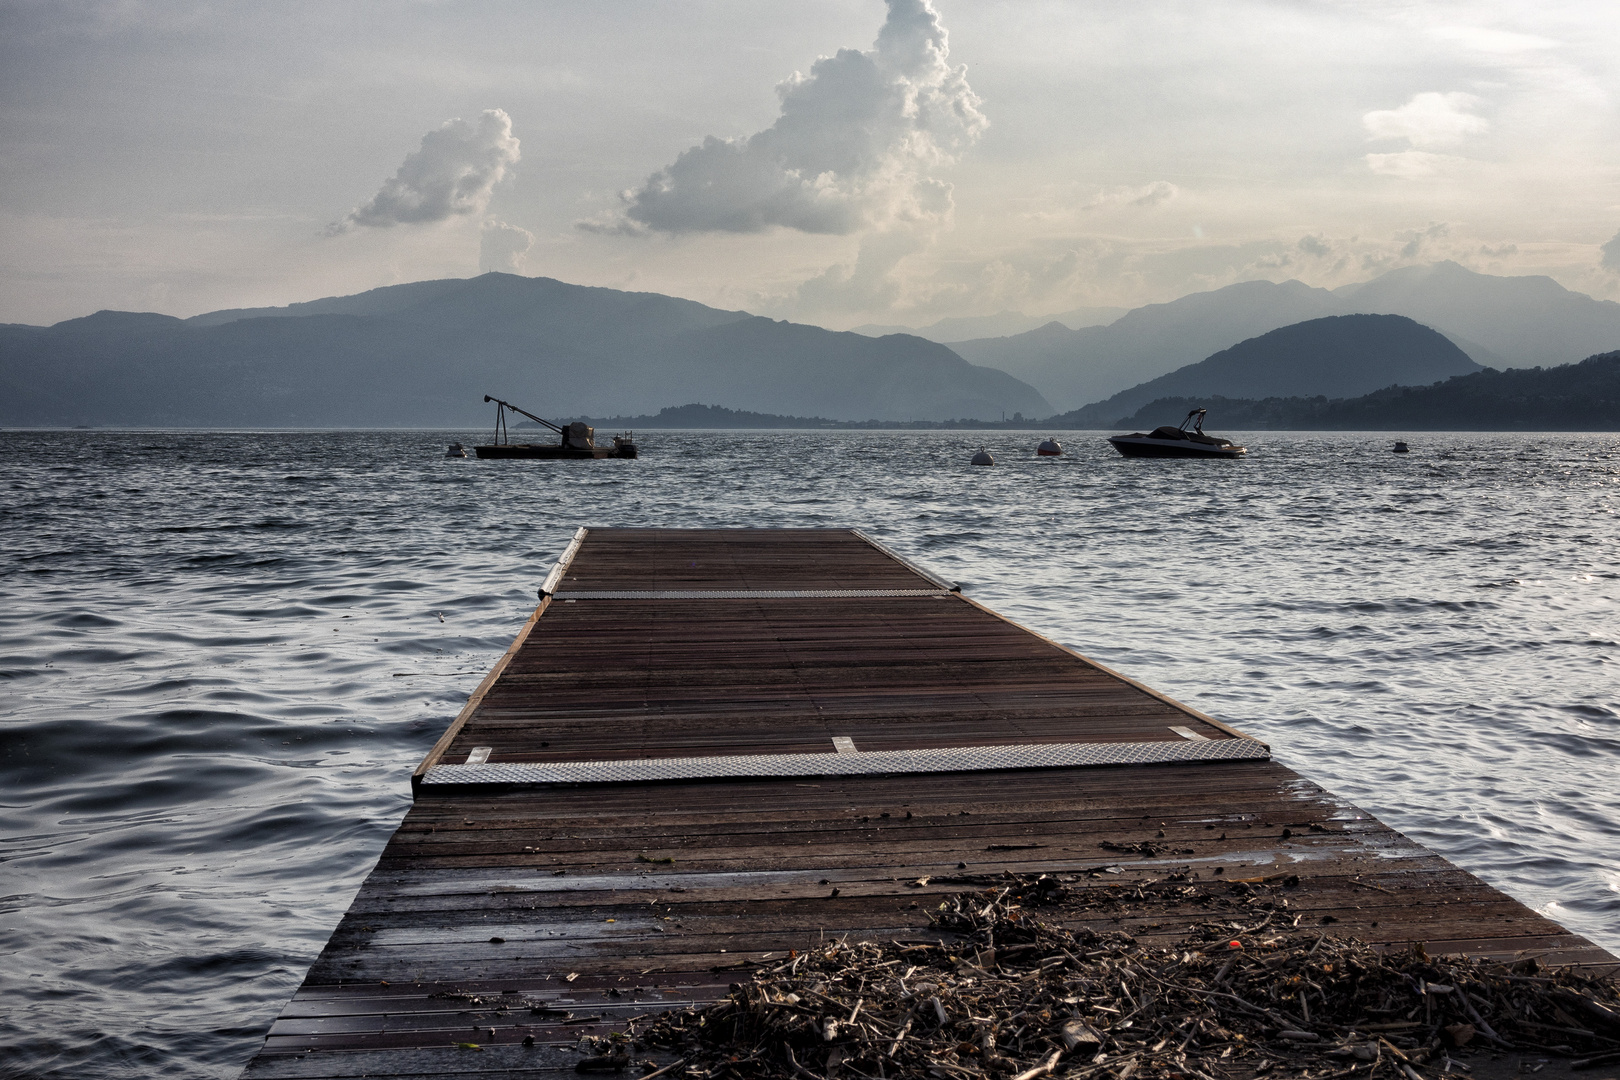 La banchina dei canottieri